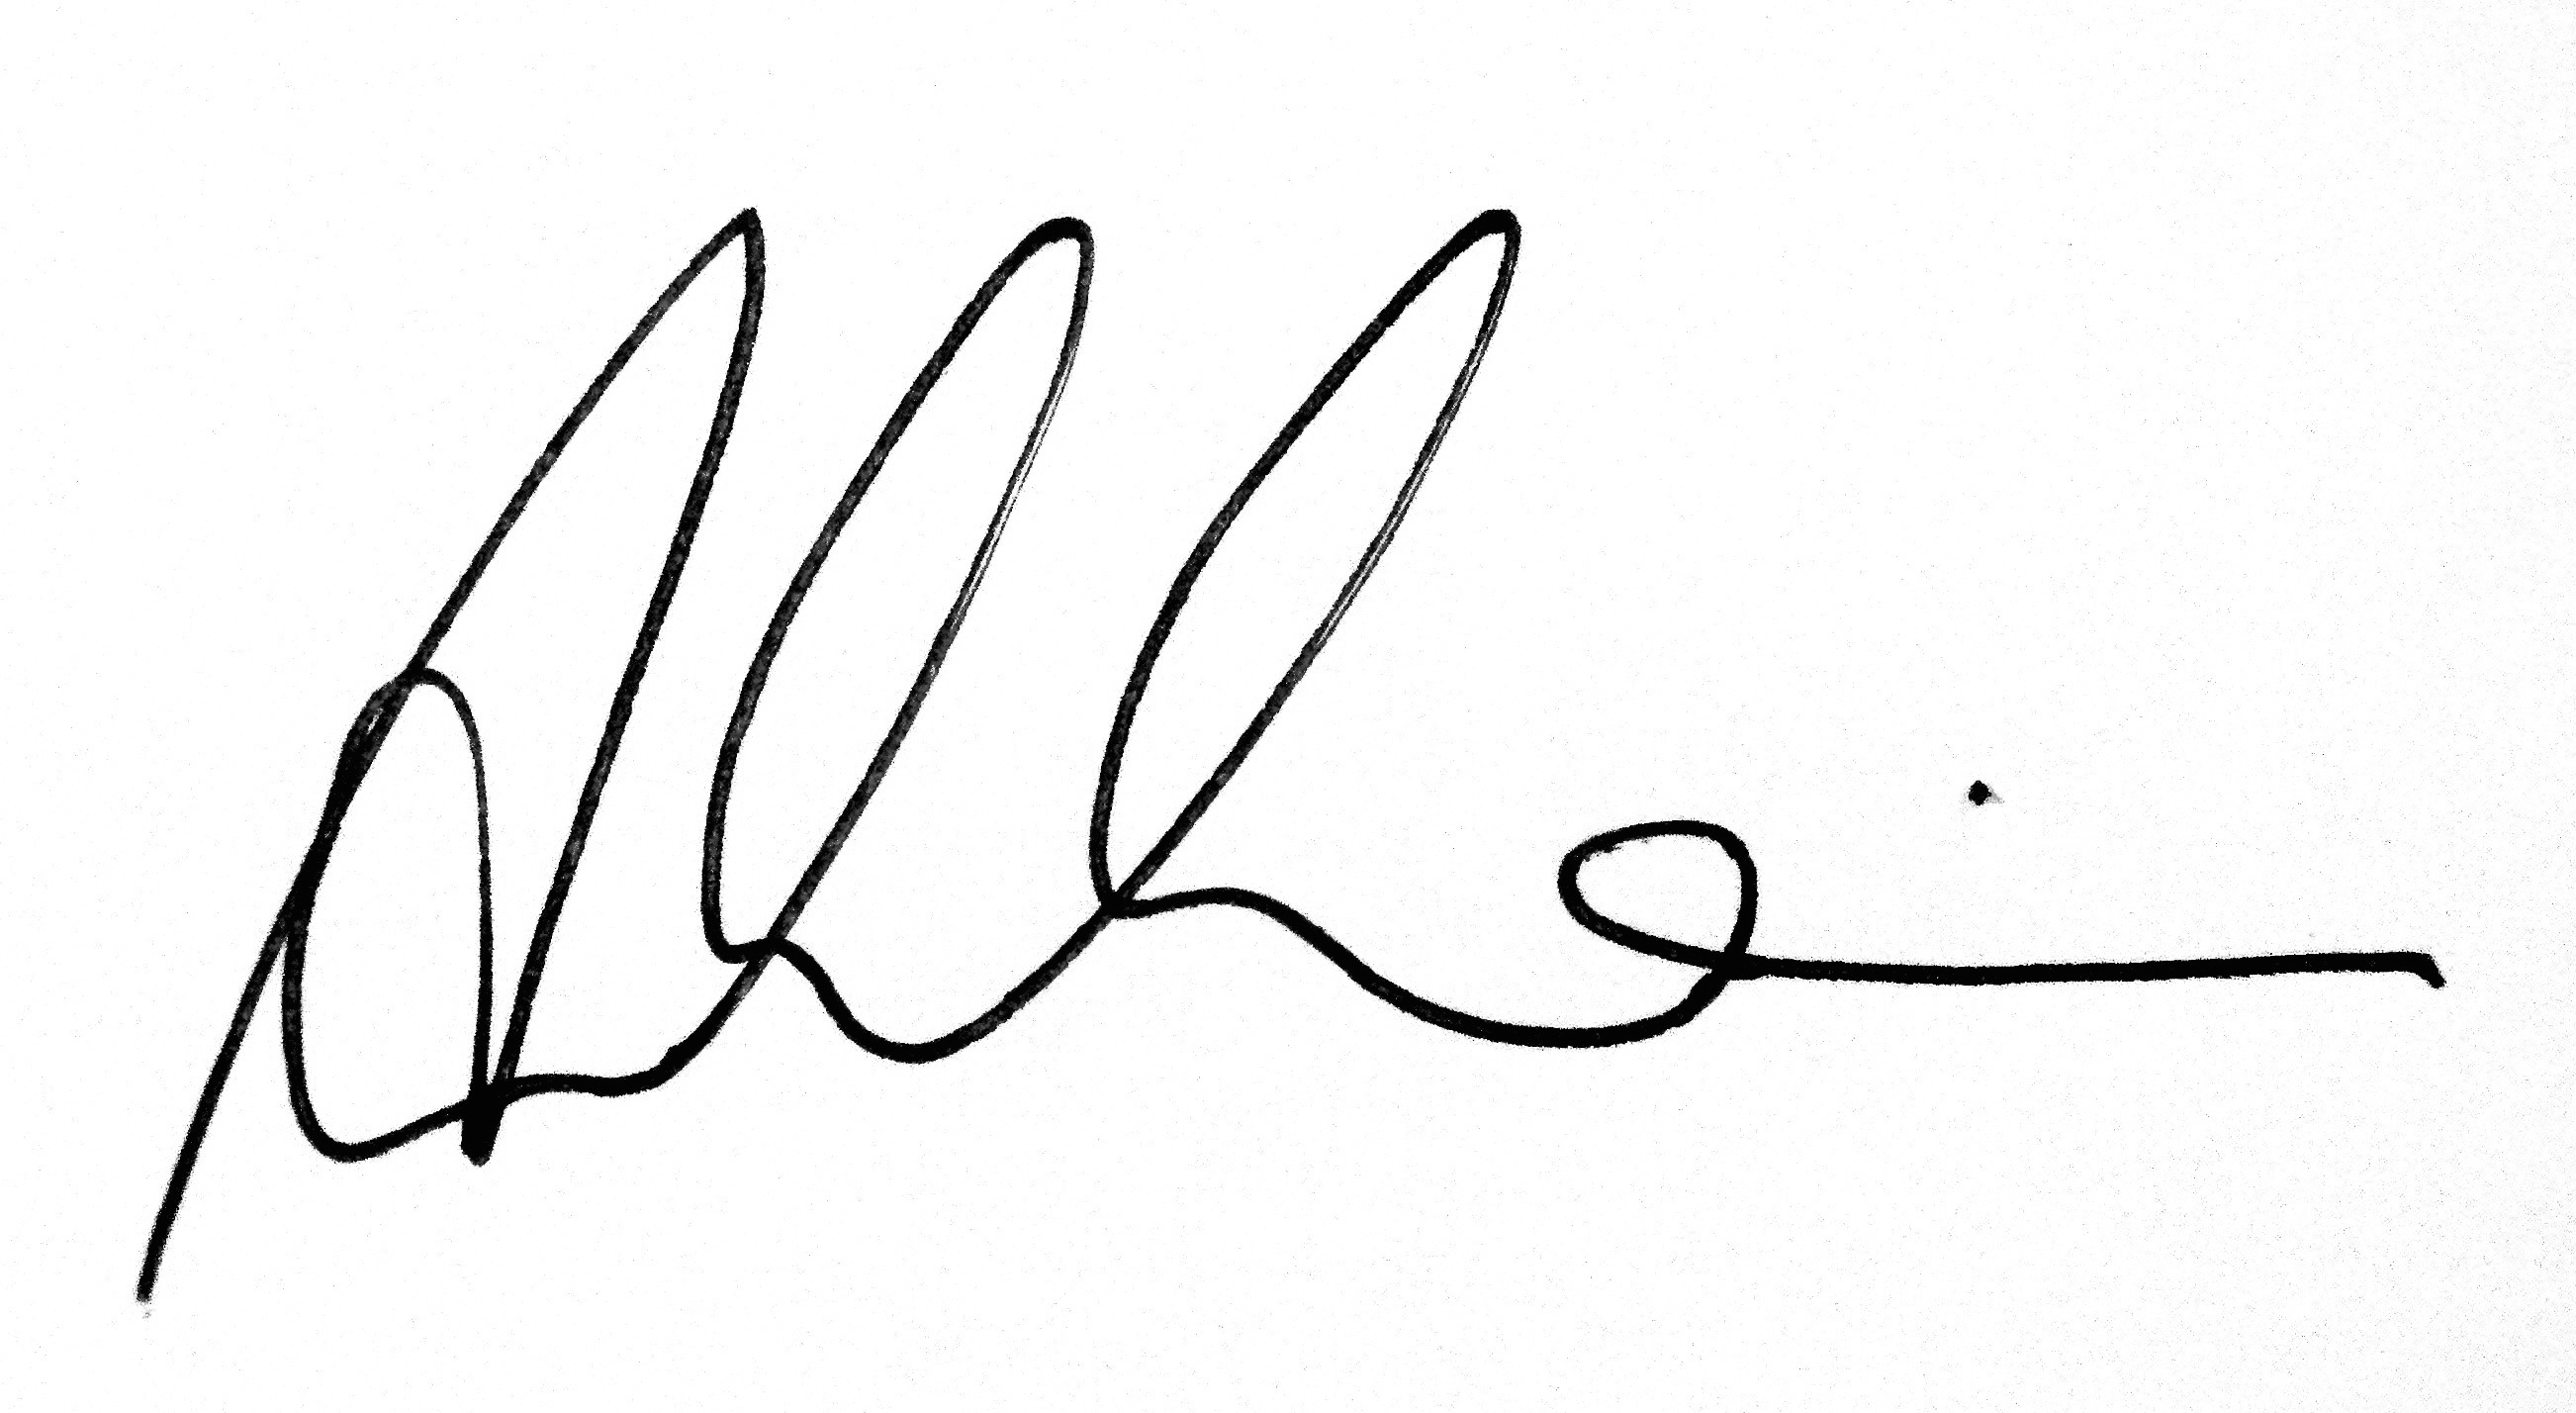 Ania Milo's Signature